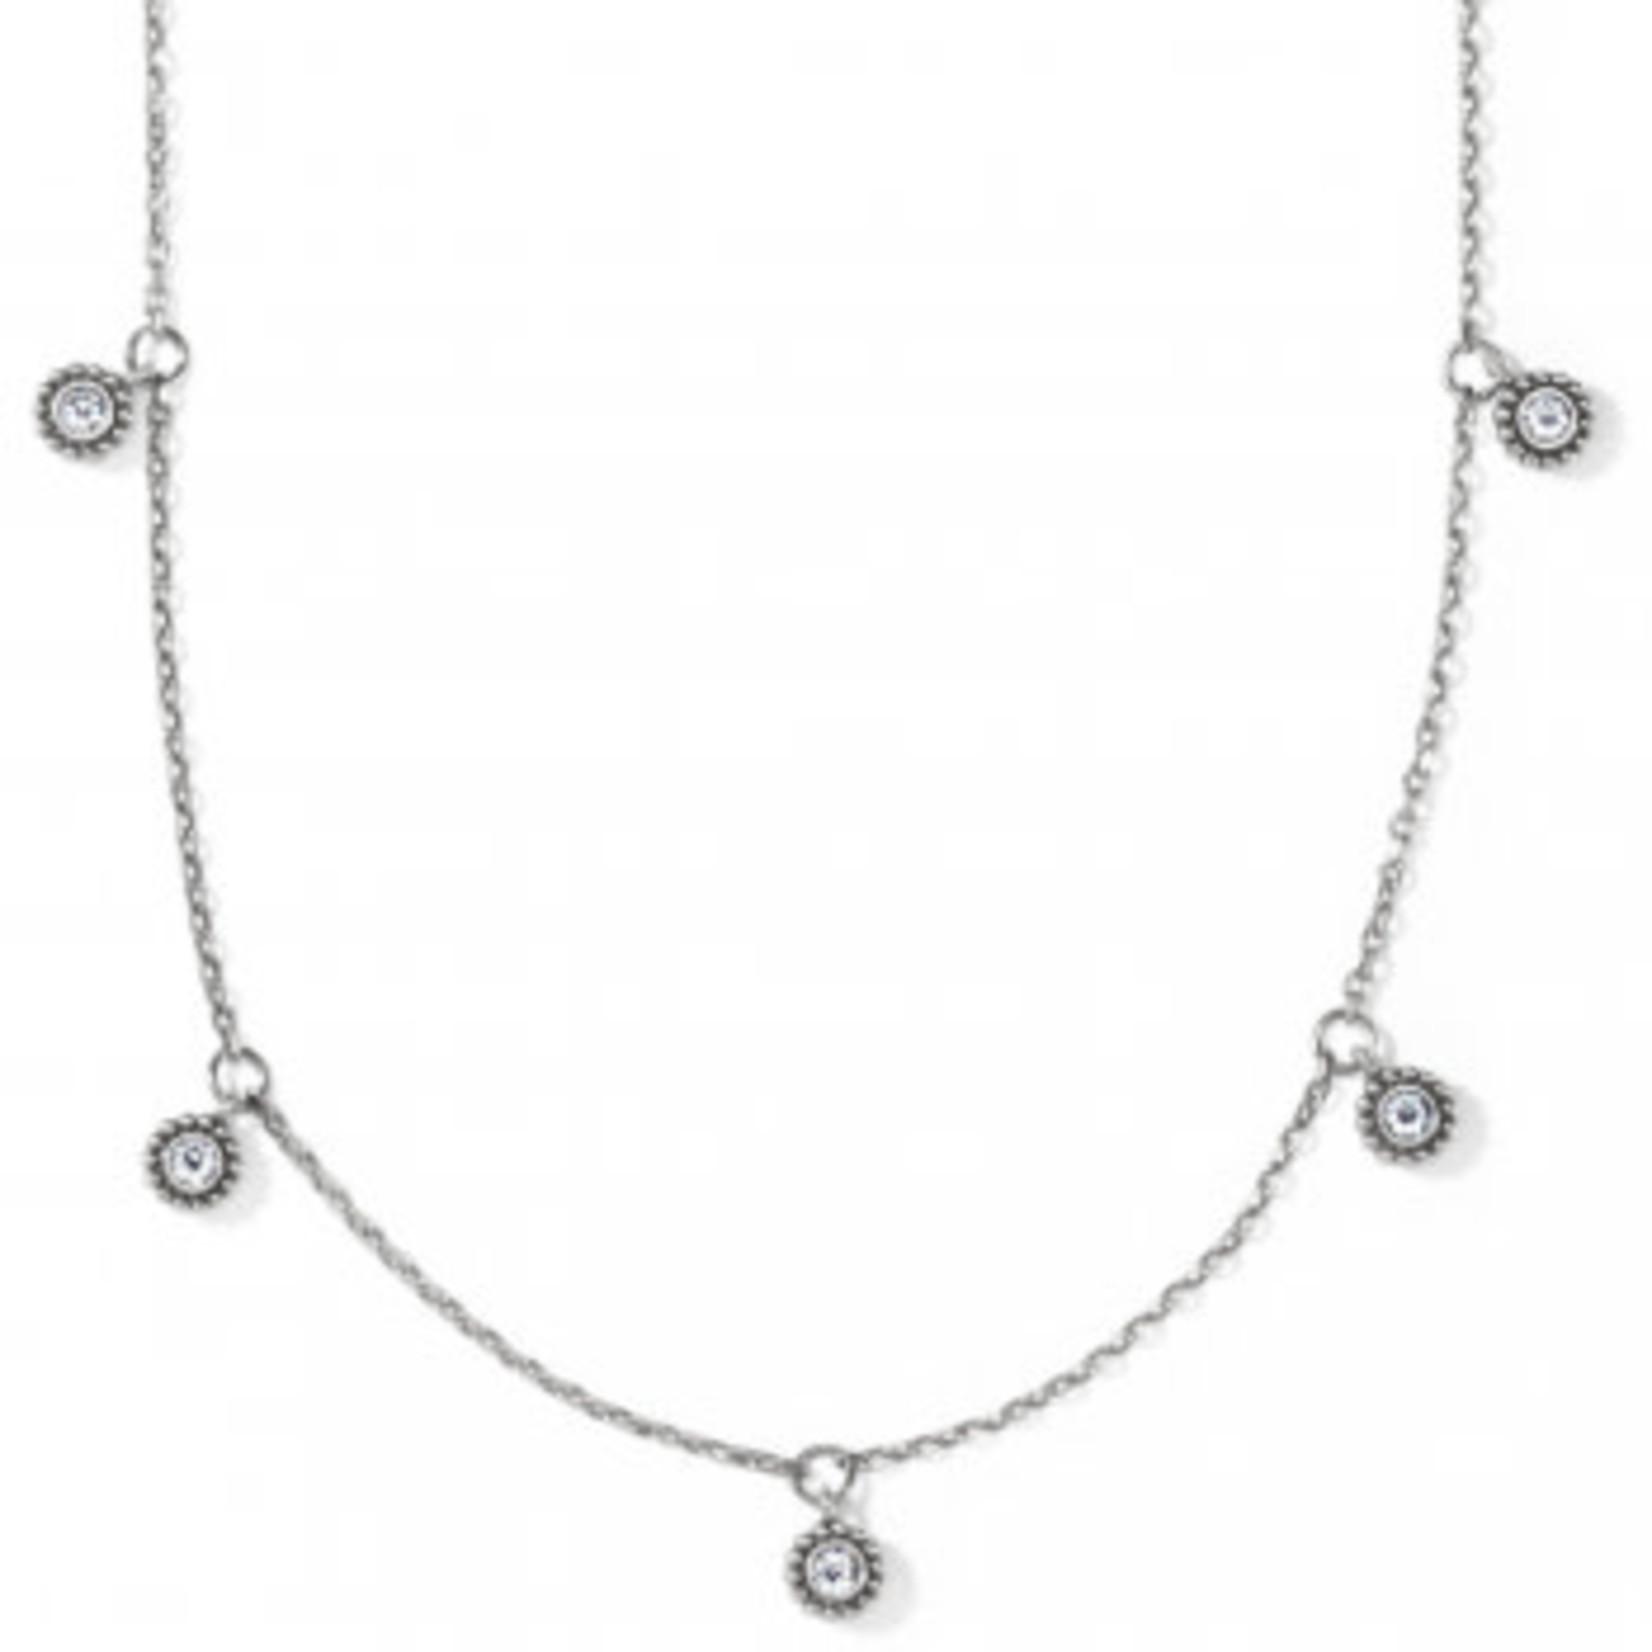 Brighton Twinkle Splendor Droplet Necklace Silver